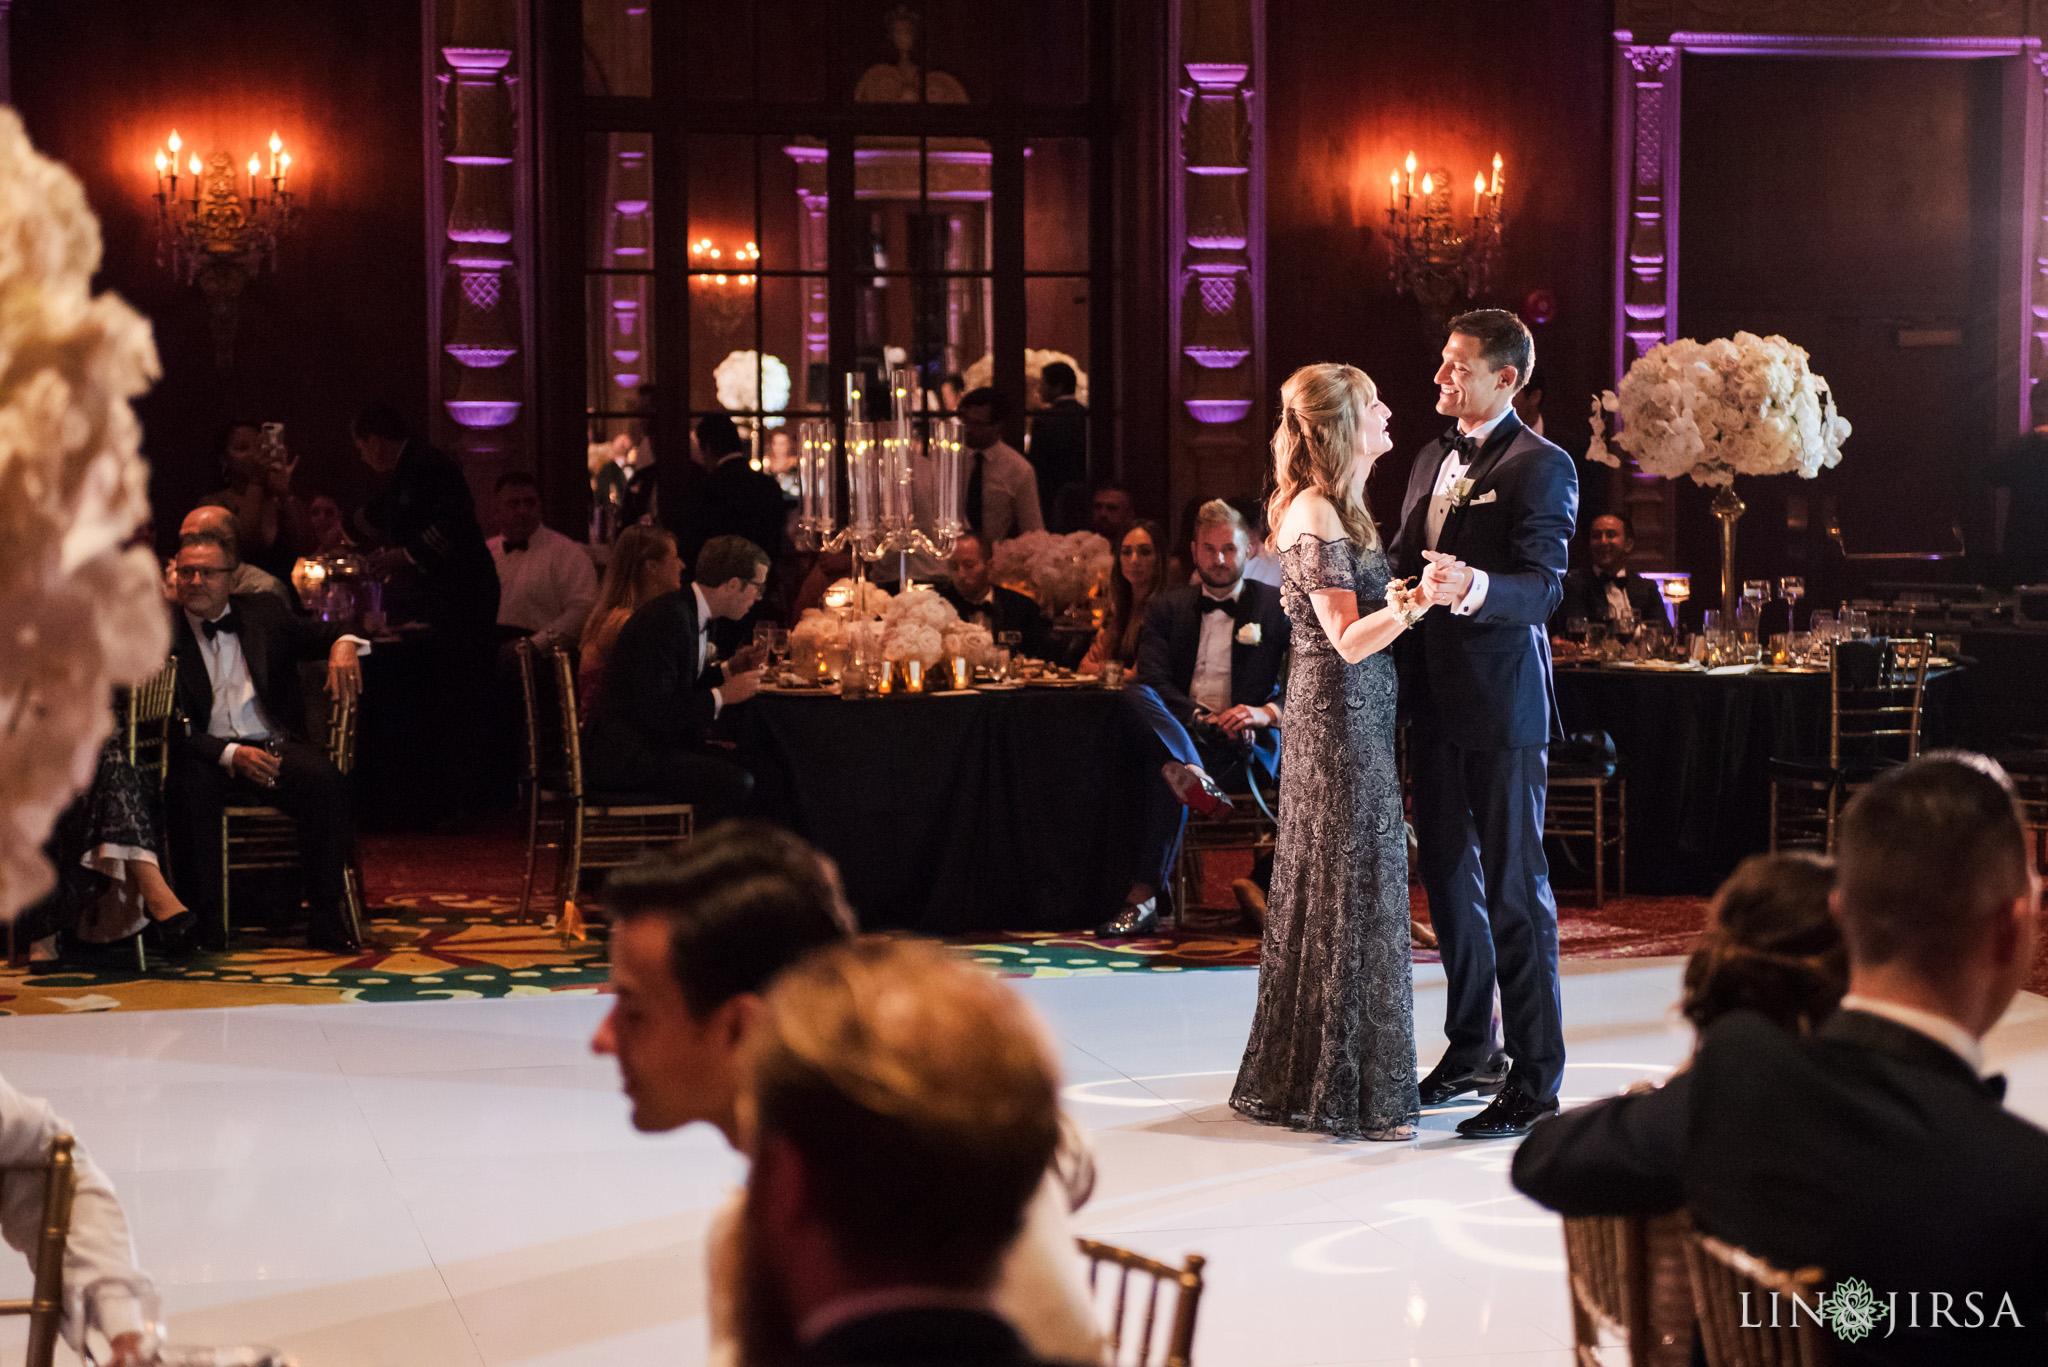 025 millennium biltmore hotel los angeles wedding photography